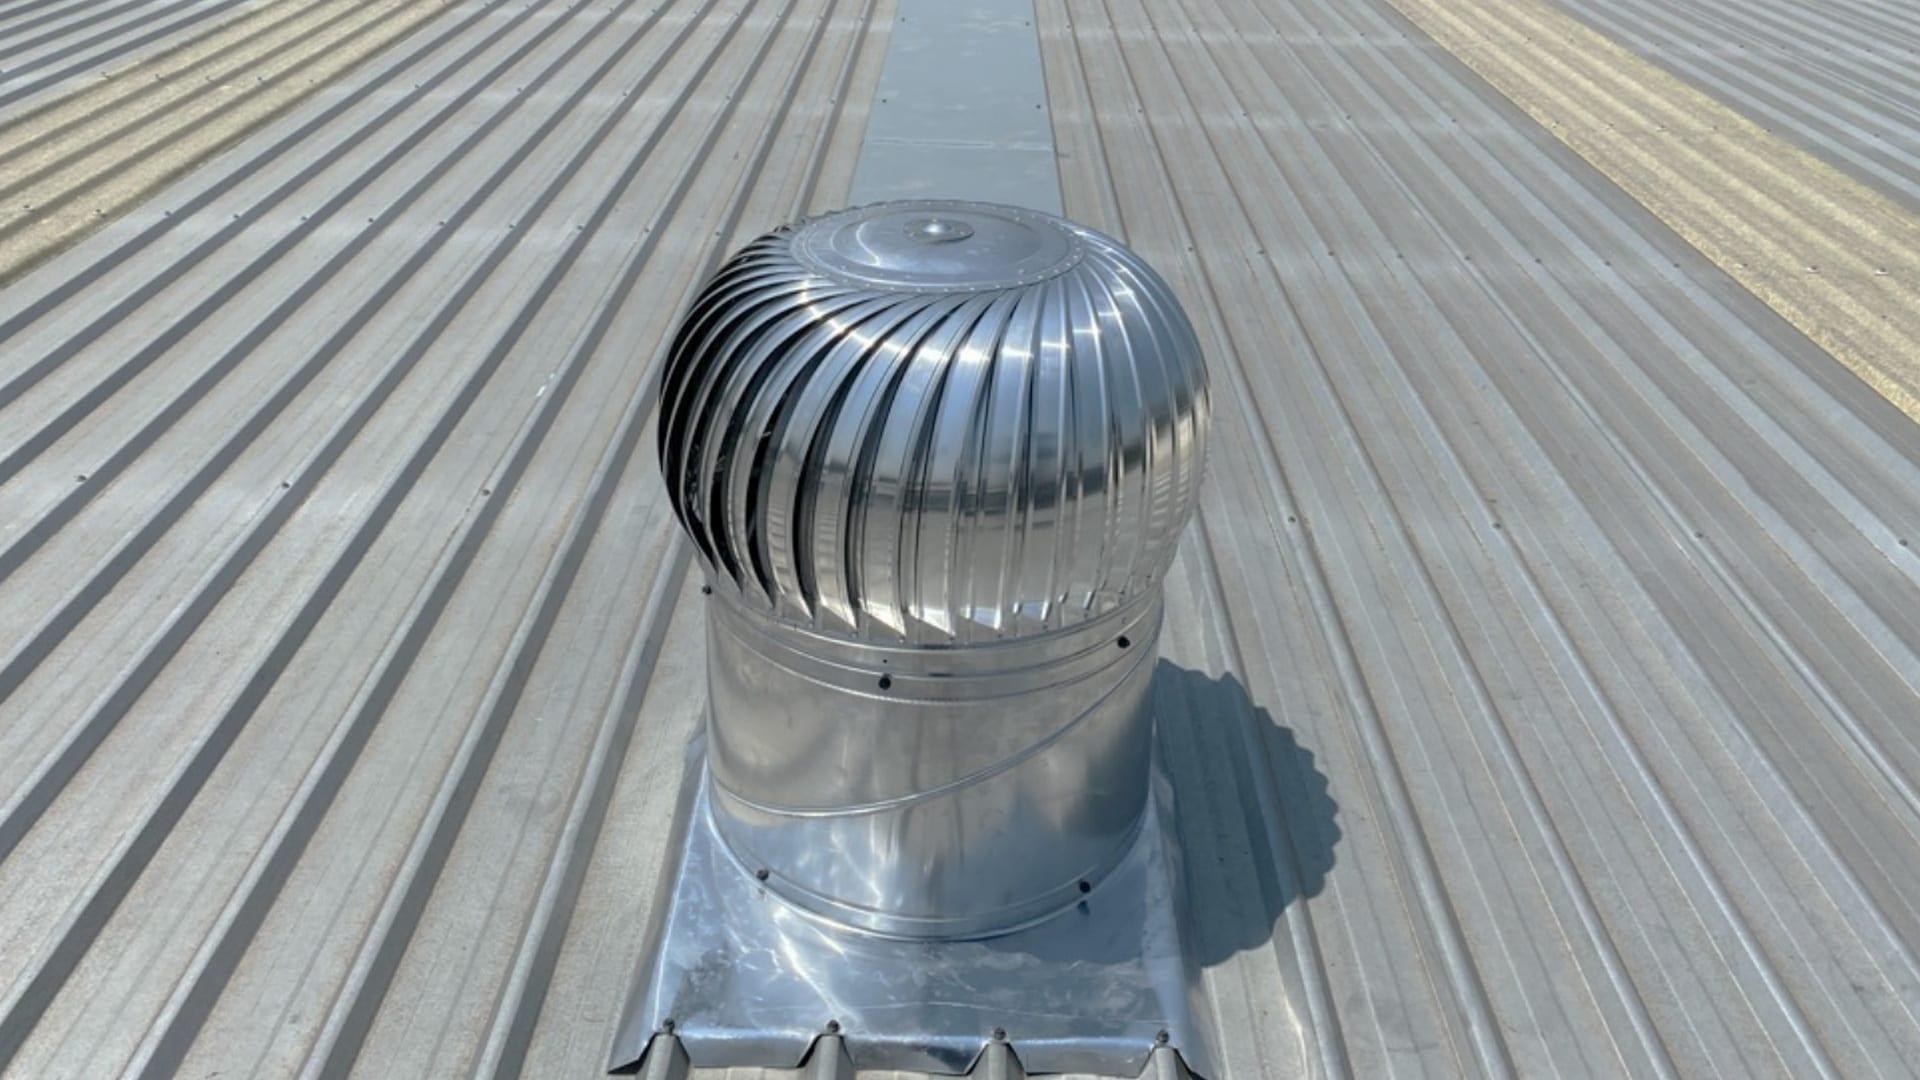 Commercial Roof Ventilators Sydney Australia